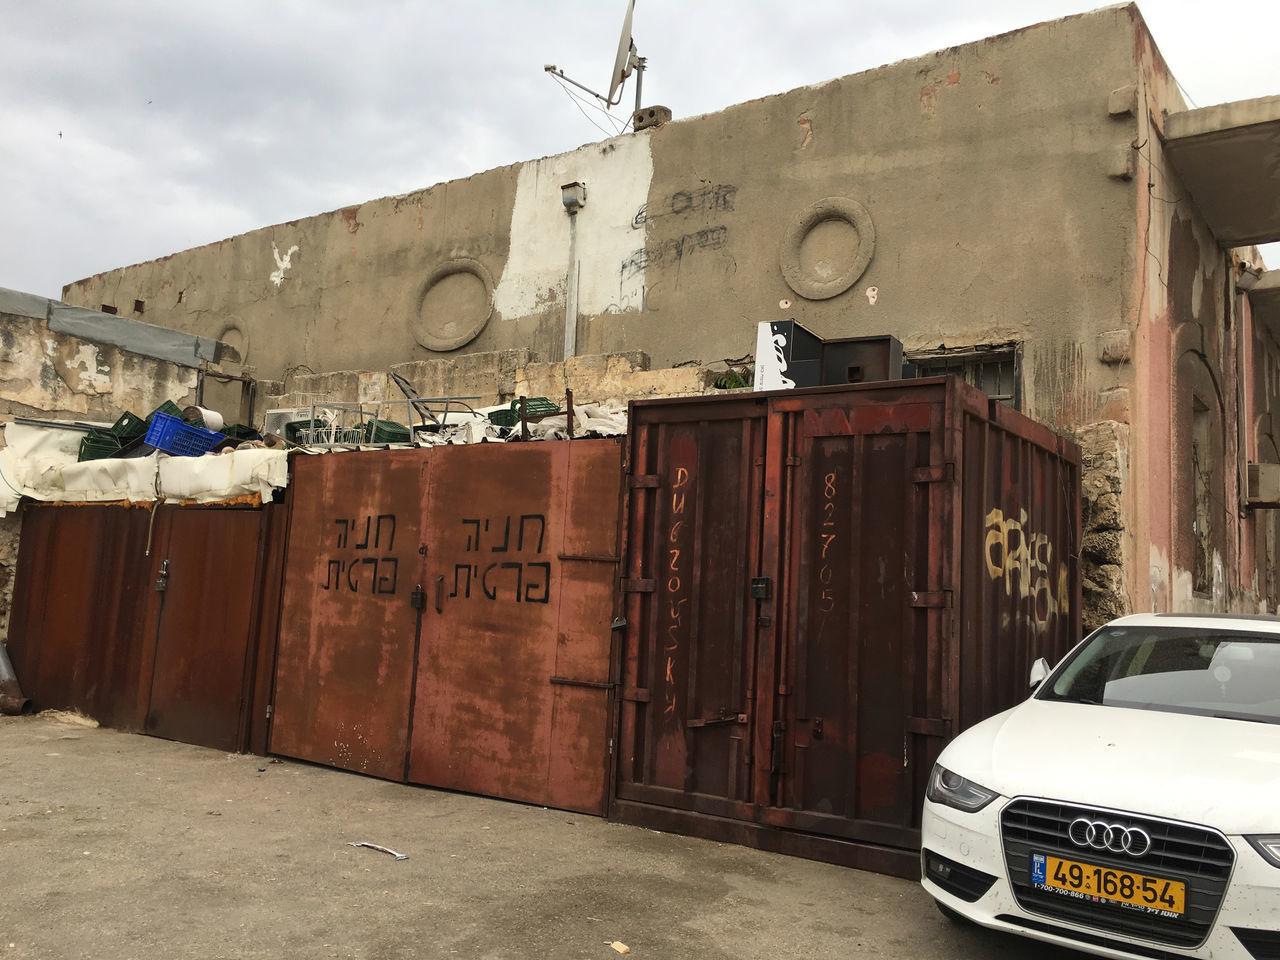 Nine Circles of Jaffa Parking Audi Car Circles Circles Pattern Garbage No People Rust Wall